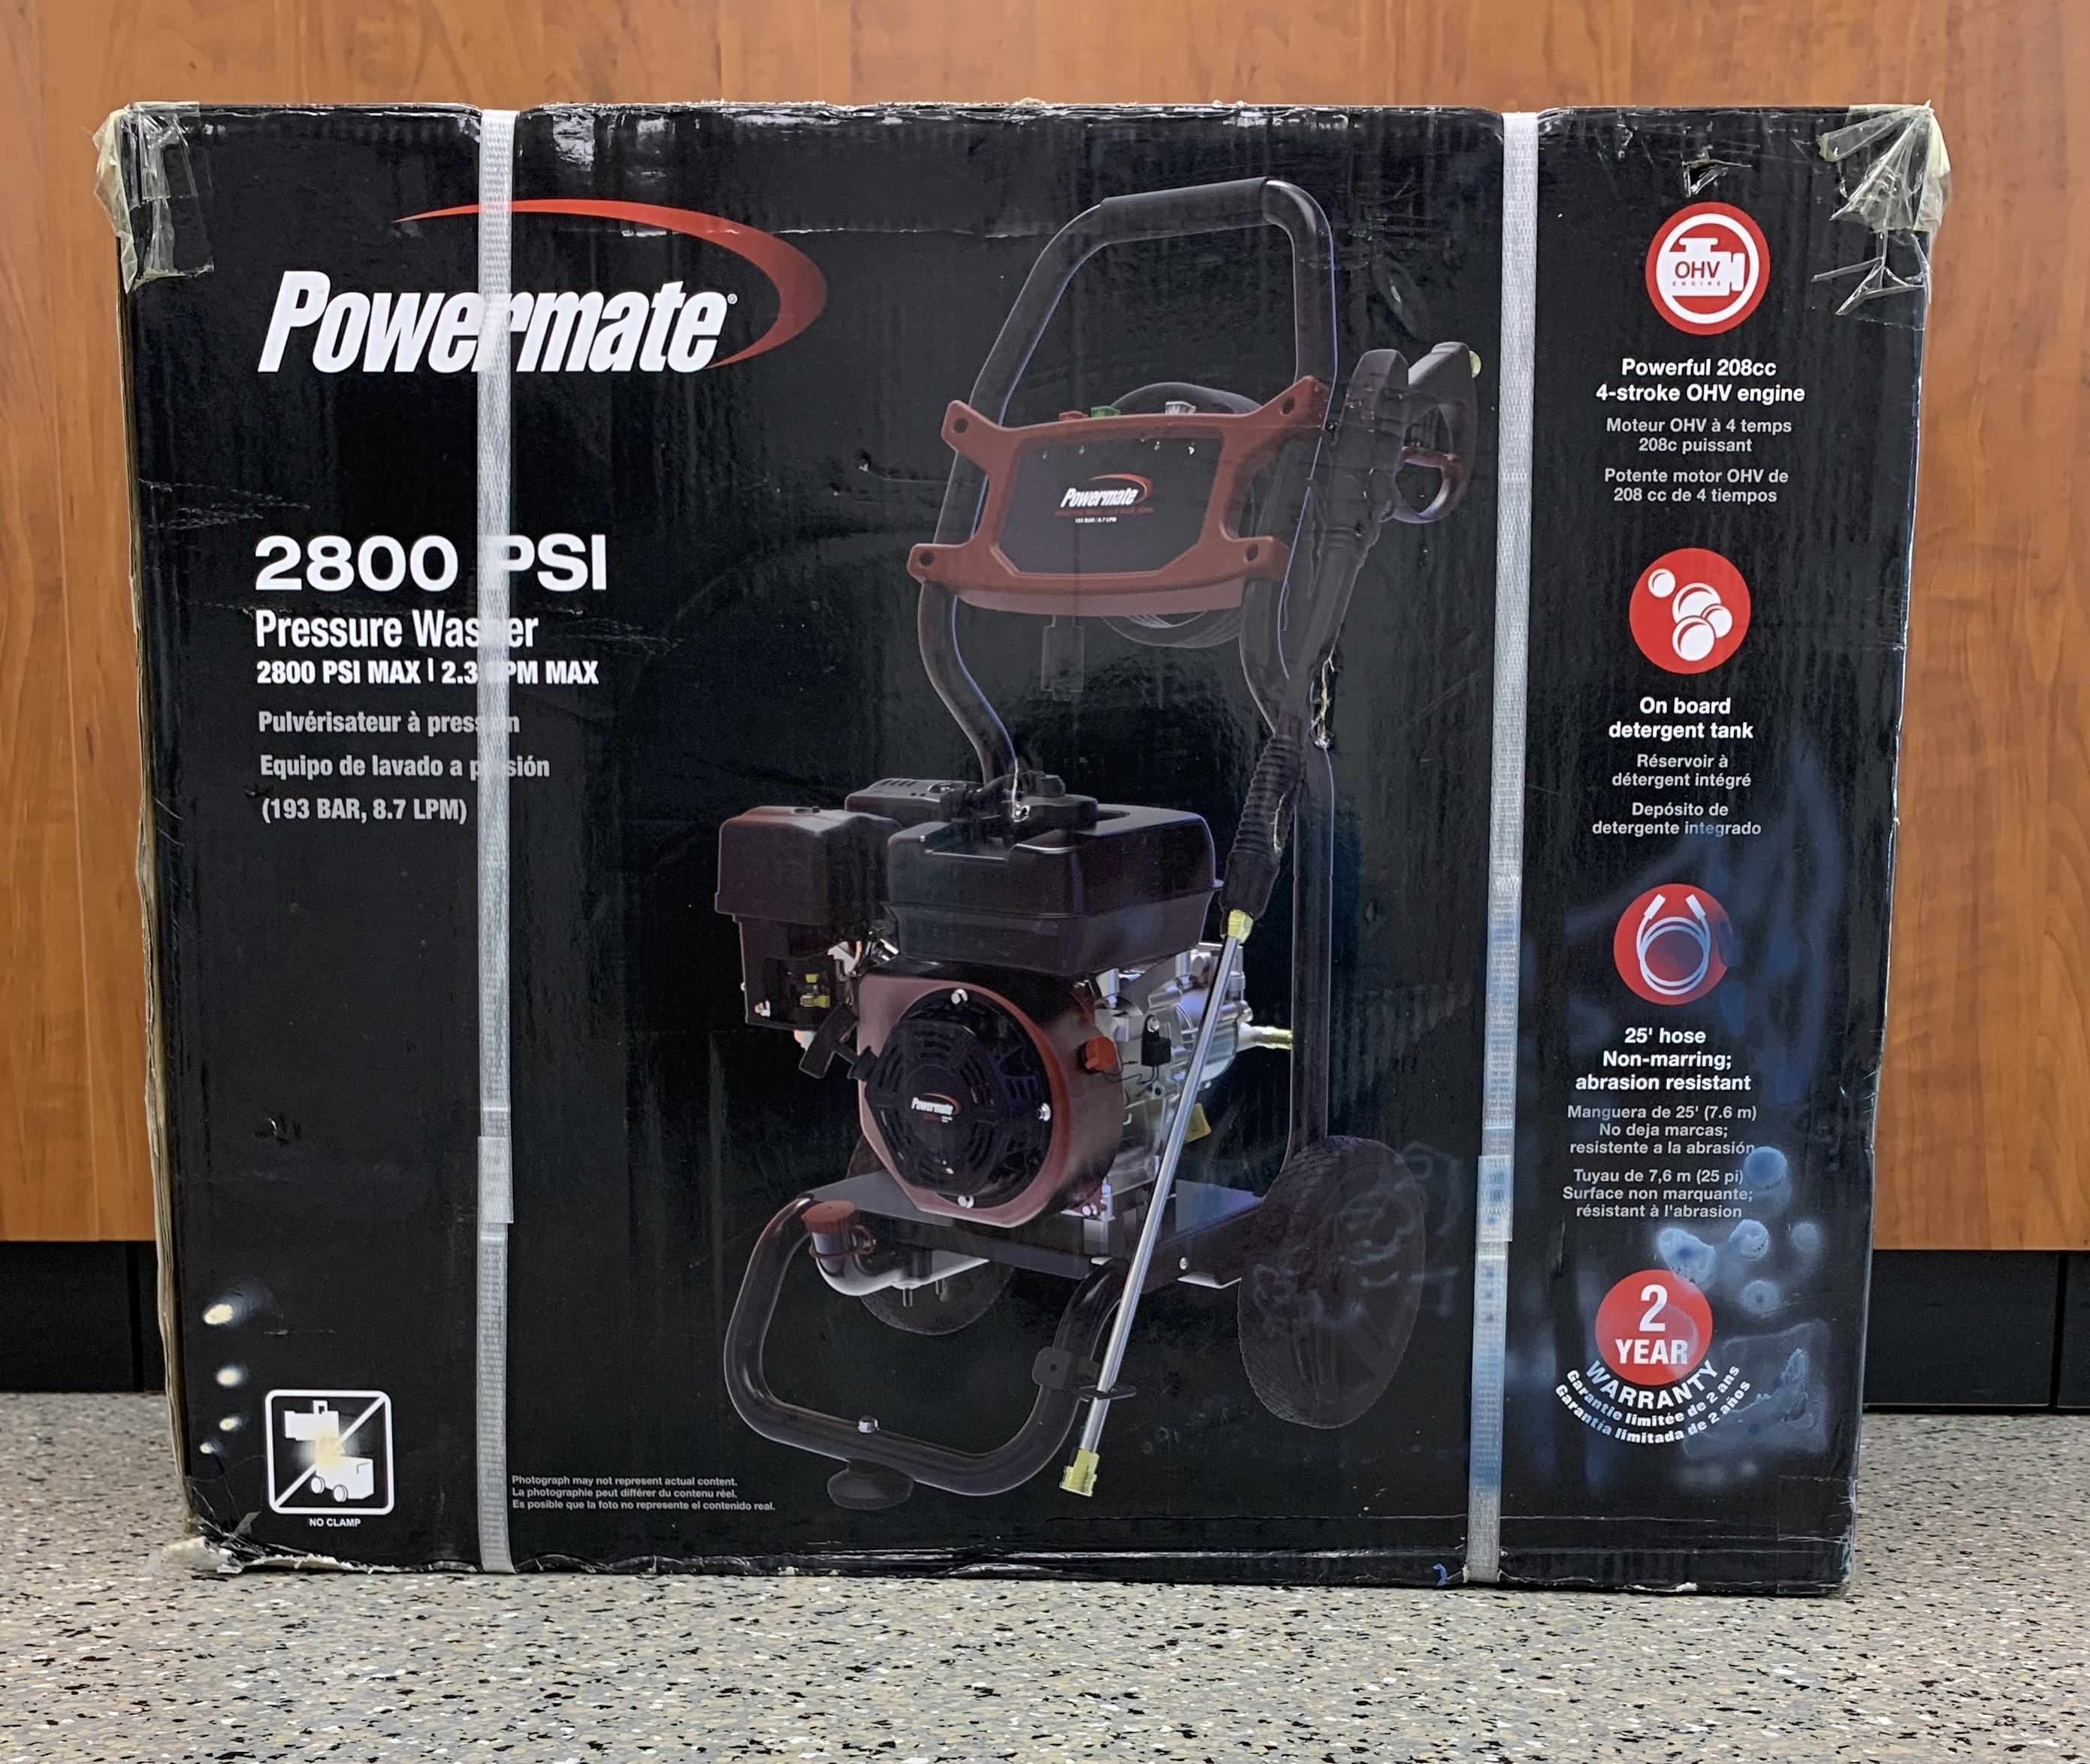 Powermate 7130 Residential Pressure Washer